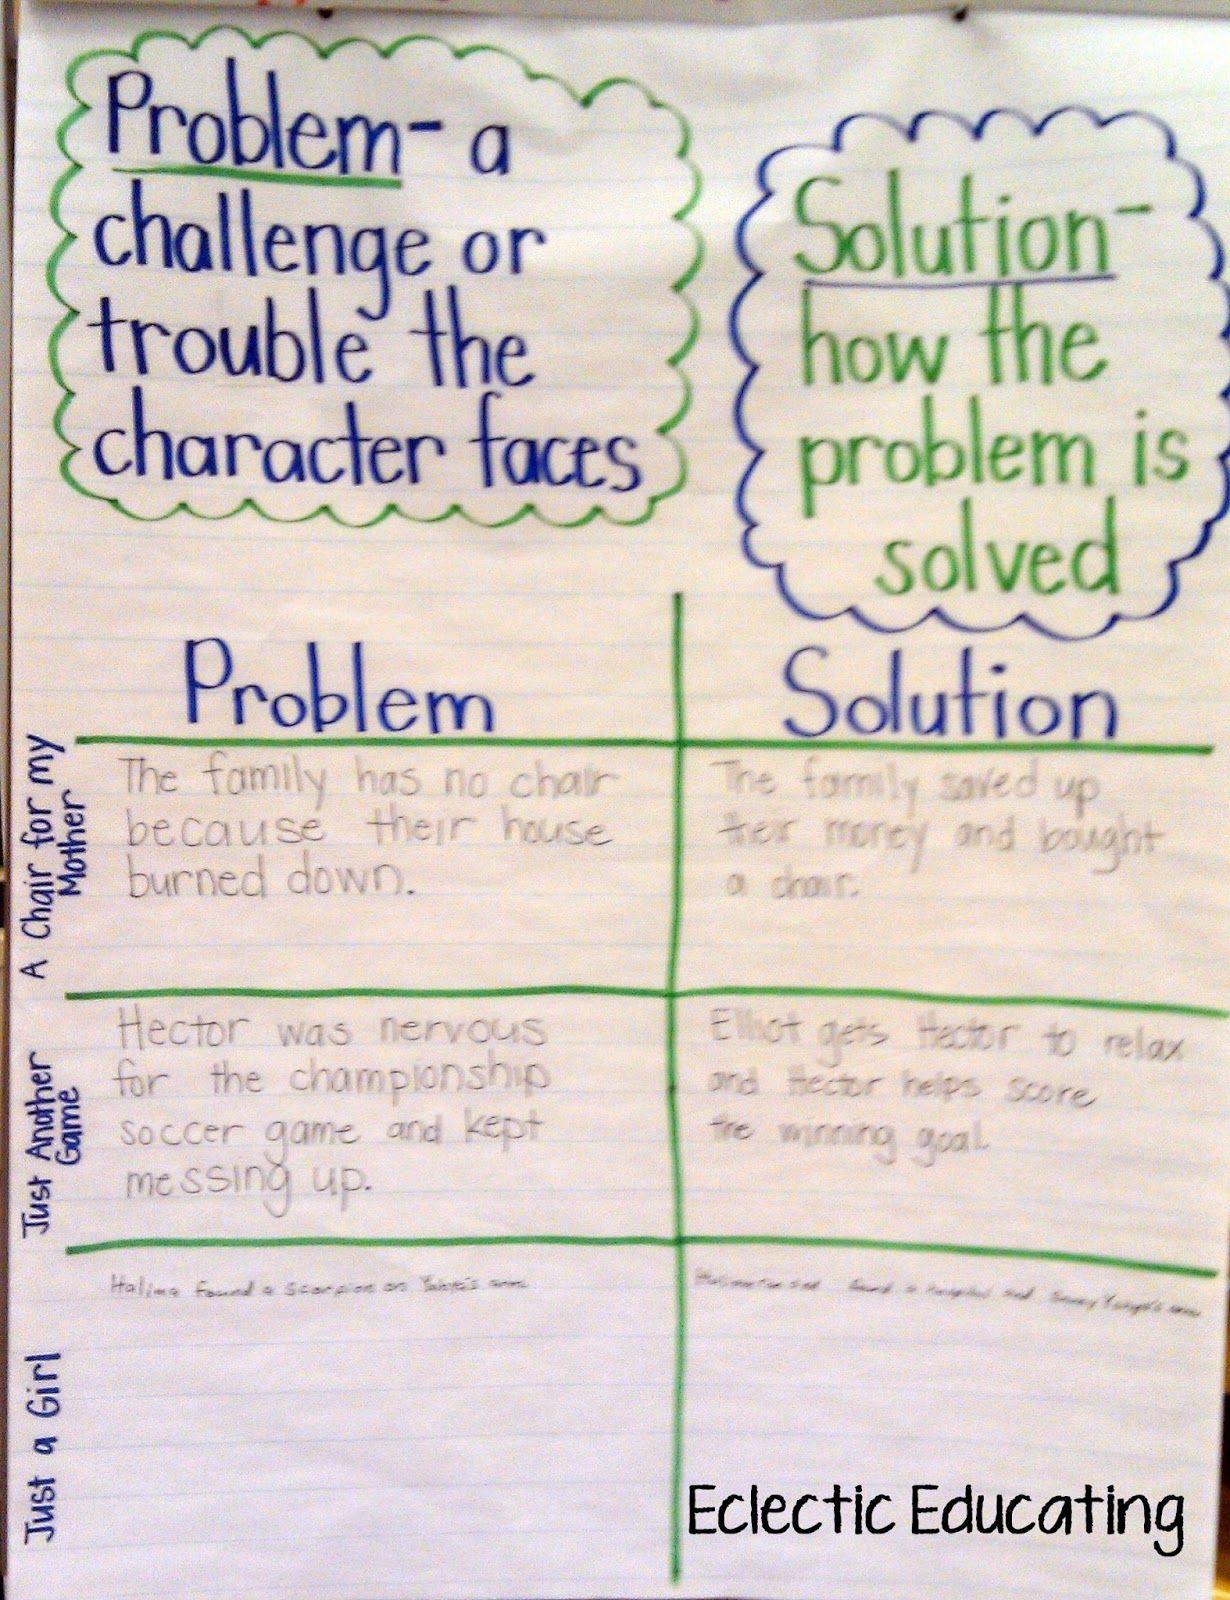 medium resolution of Eclectic Educating: Problem and Solution   Problem and solution